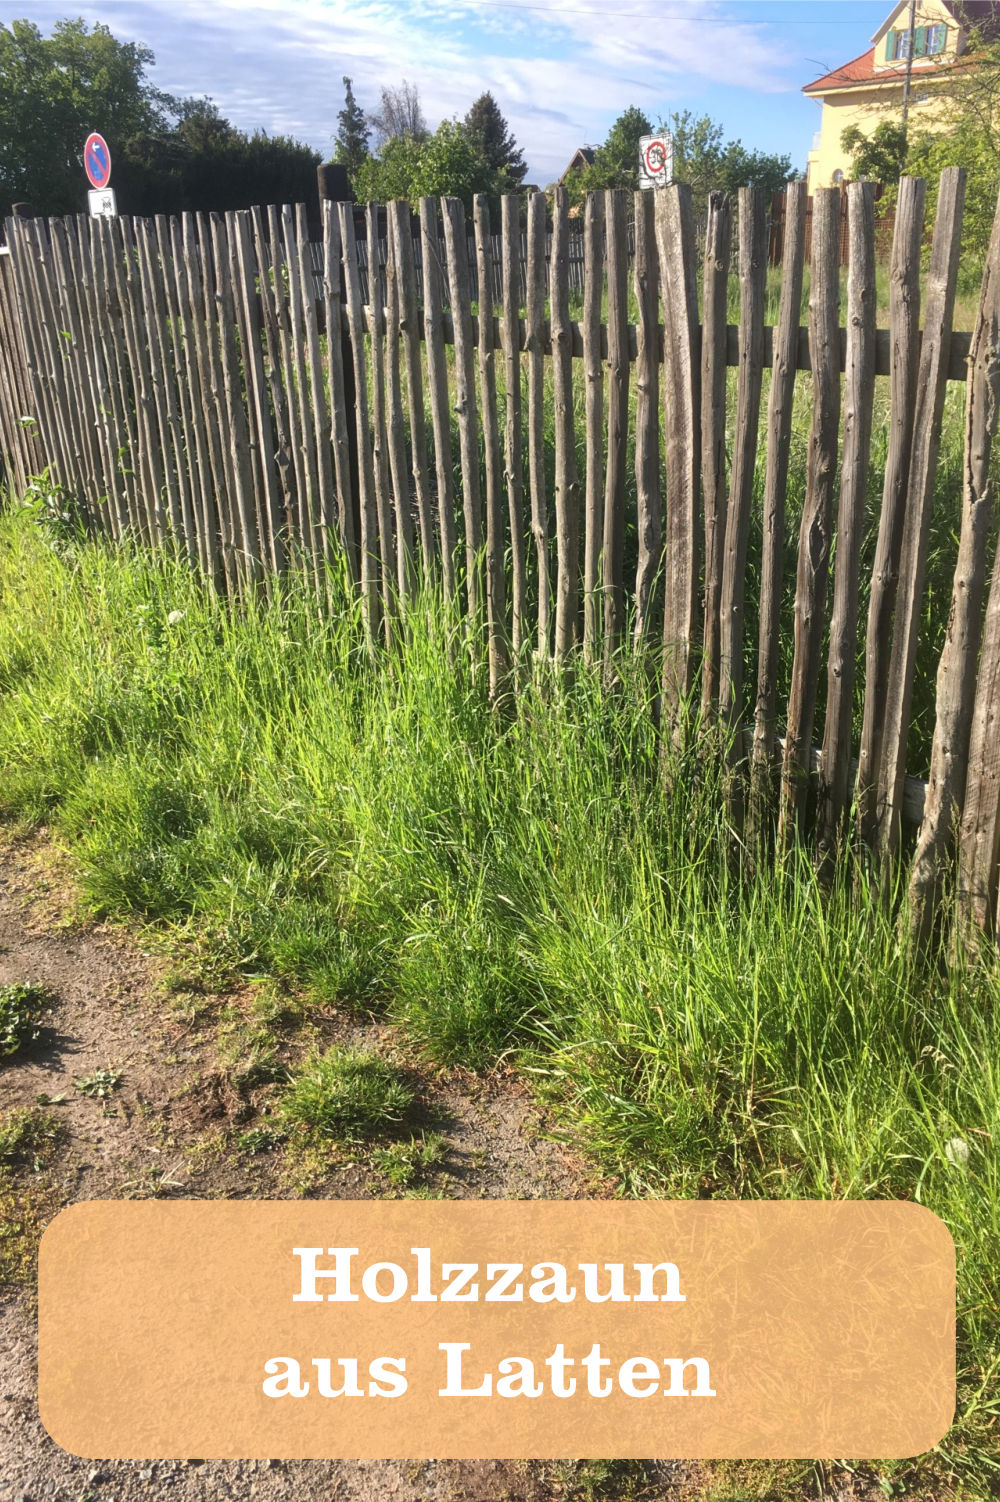 Holzzaun aus Latten